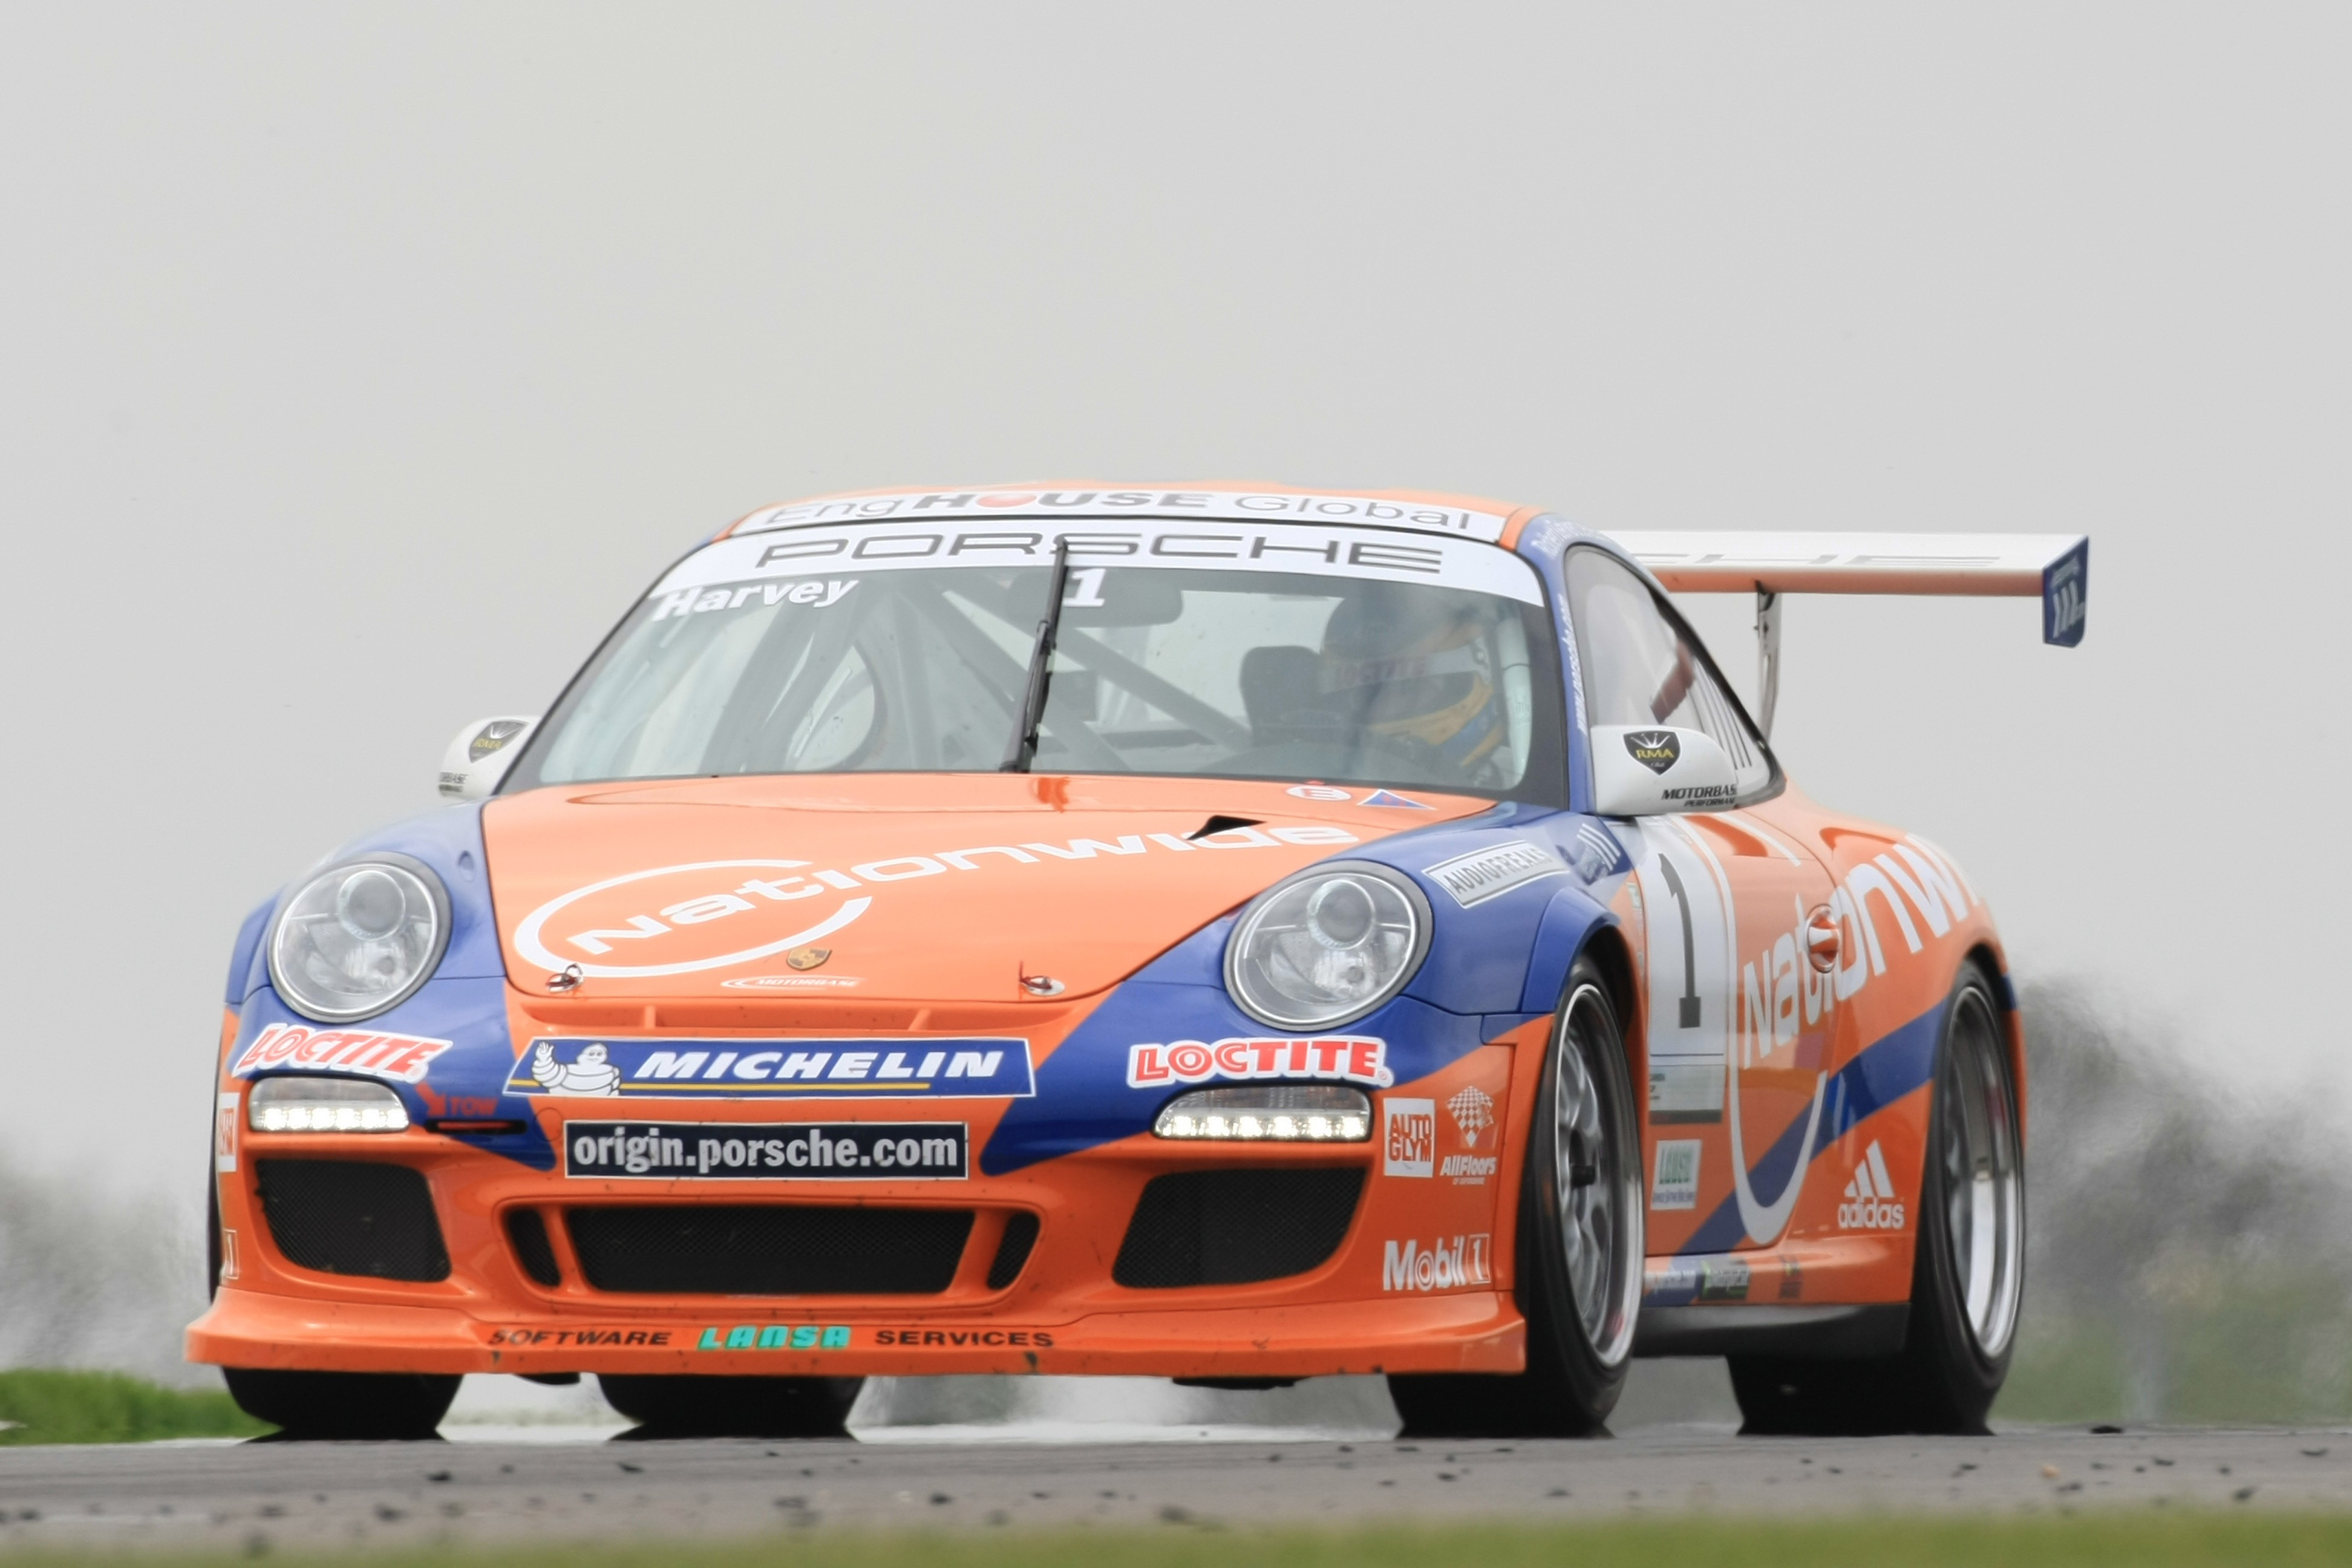 Tim Harvey (GBR) Motorbase Porsche Carrera Cup, Donington, 2011